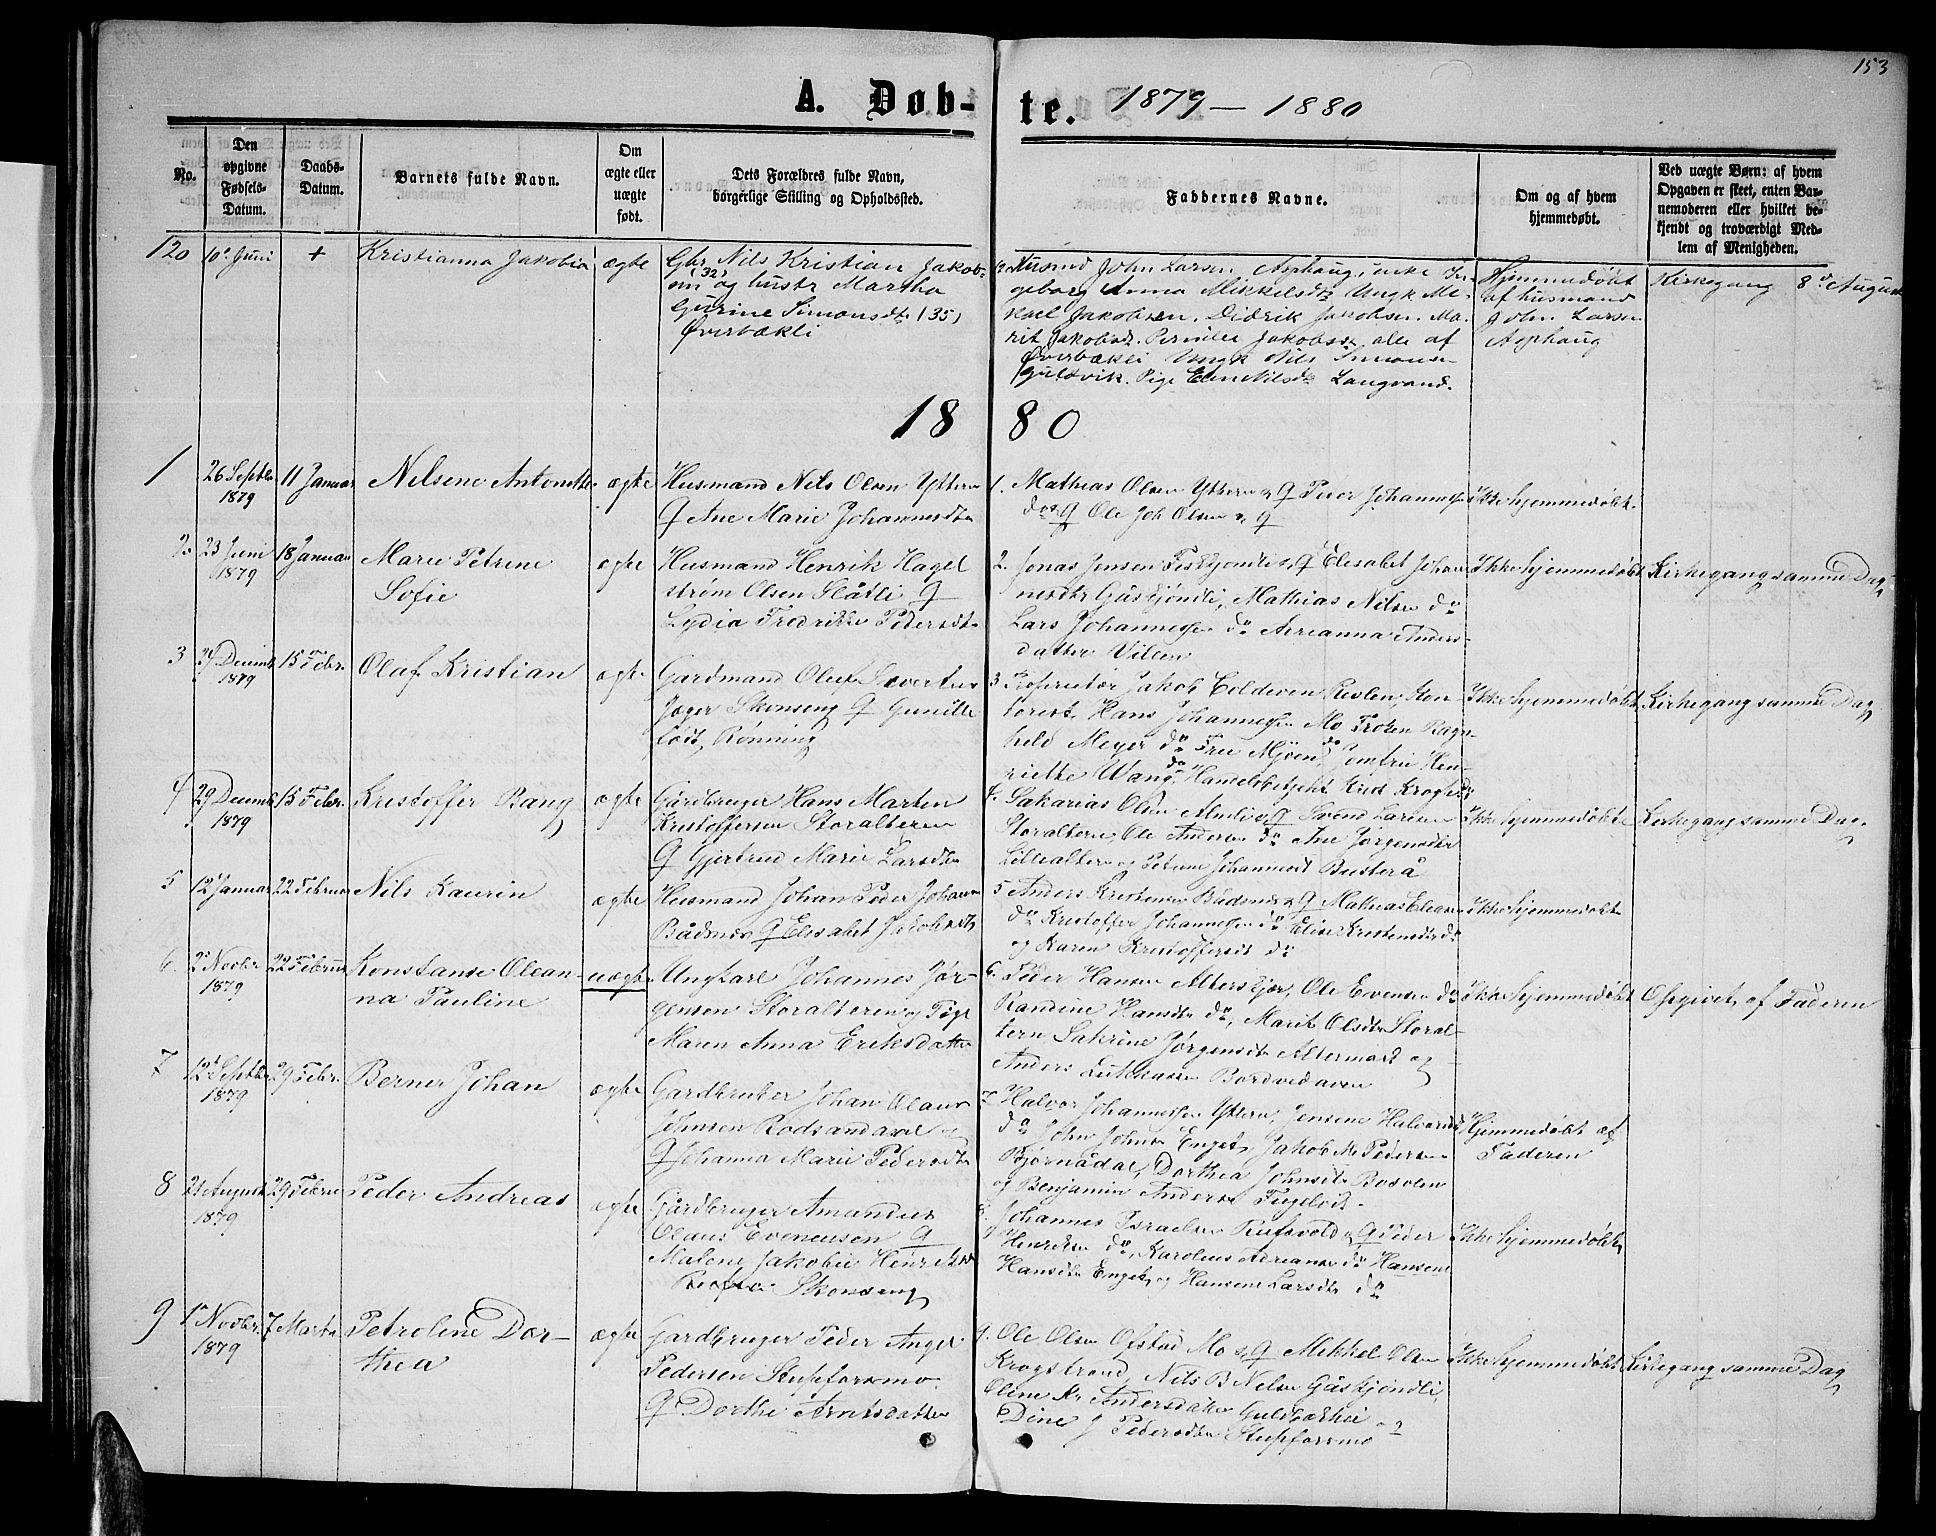 SAT, Ministerialprotokoller, klokkerbøker og fødselsregistre - Nordland, 827/L0415: Klokkerbok nr. 827C04, 1864-1886, s. 153